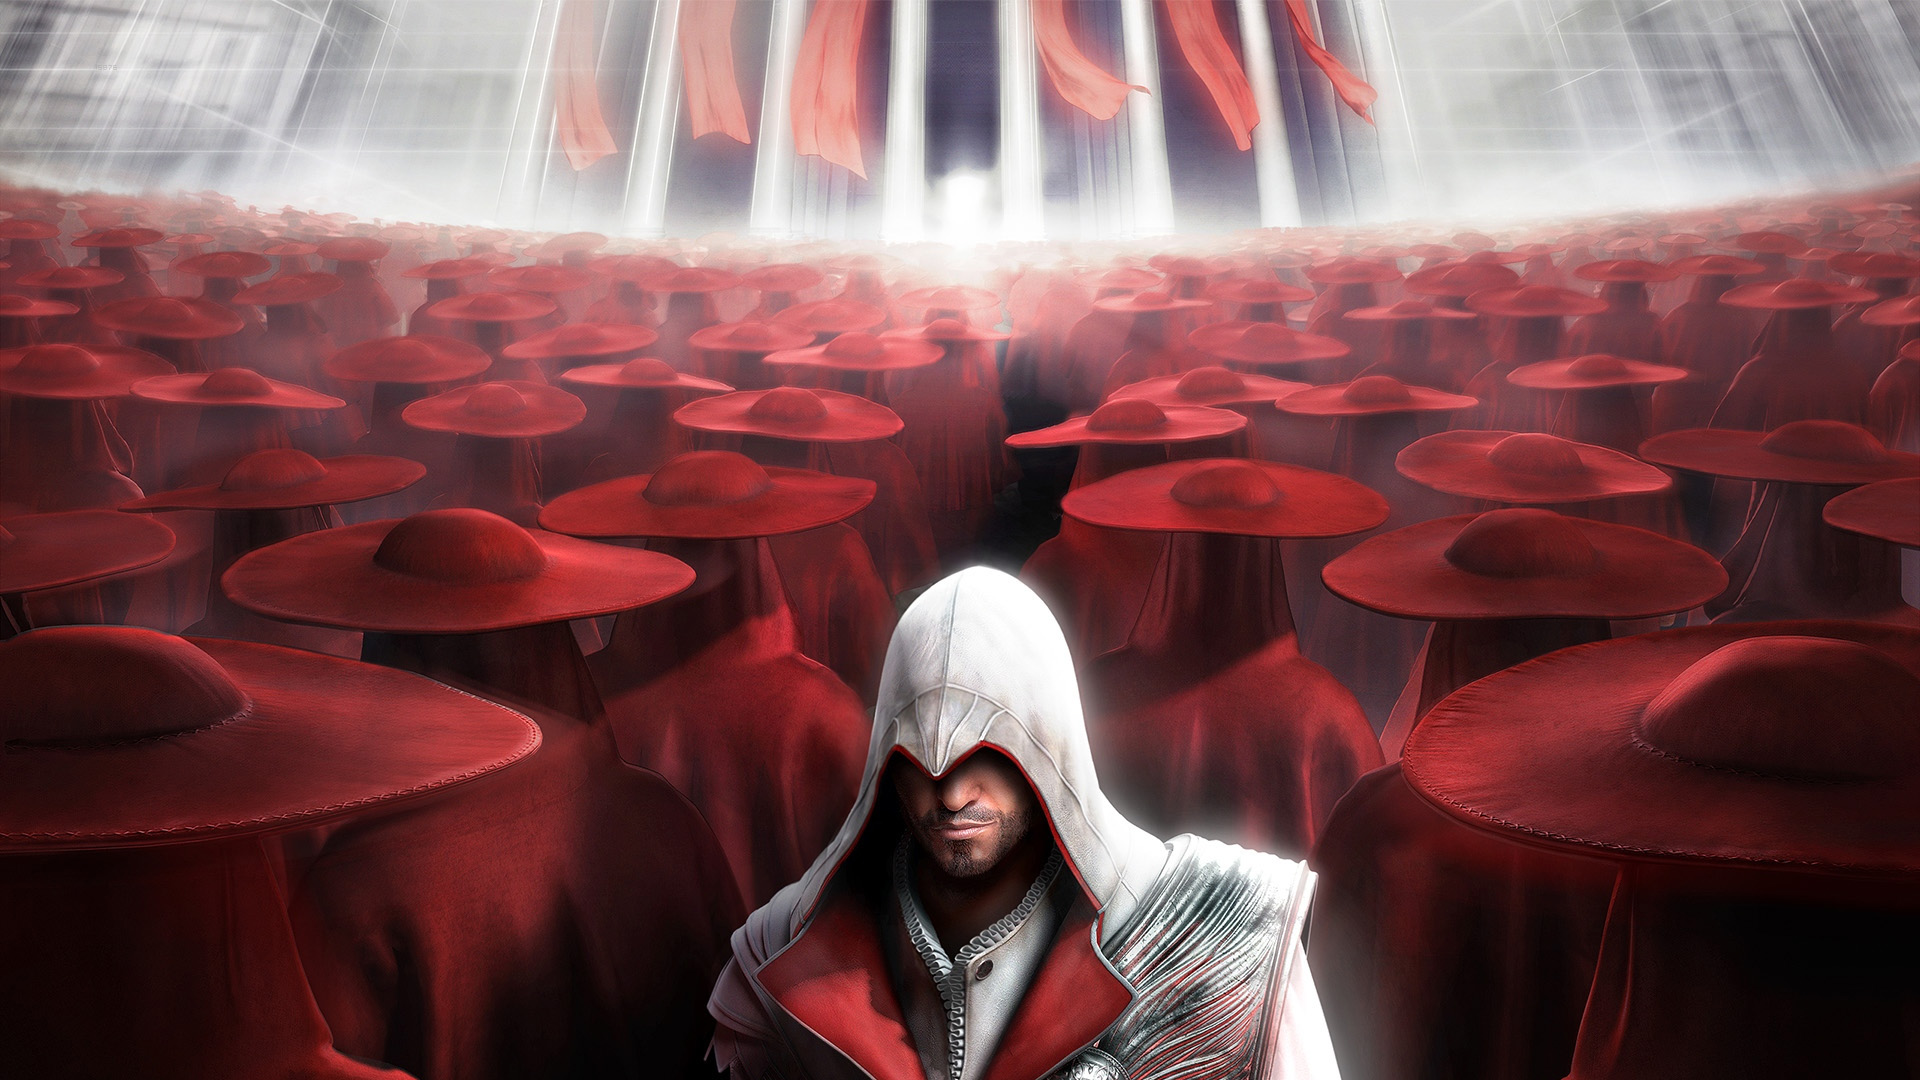 Assassin's Creed: Brotherhood HD Wallpaper | Background ...Assassins Creed Brotherhood Wallpaper 1920x1080